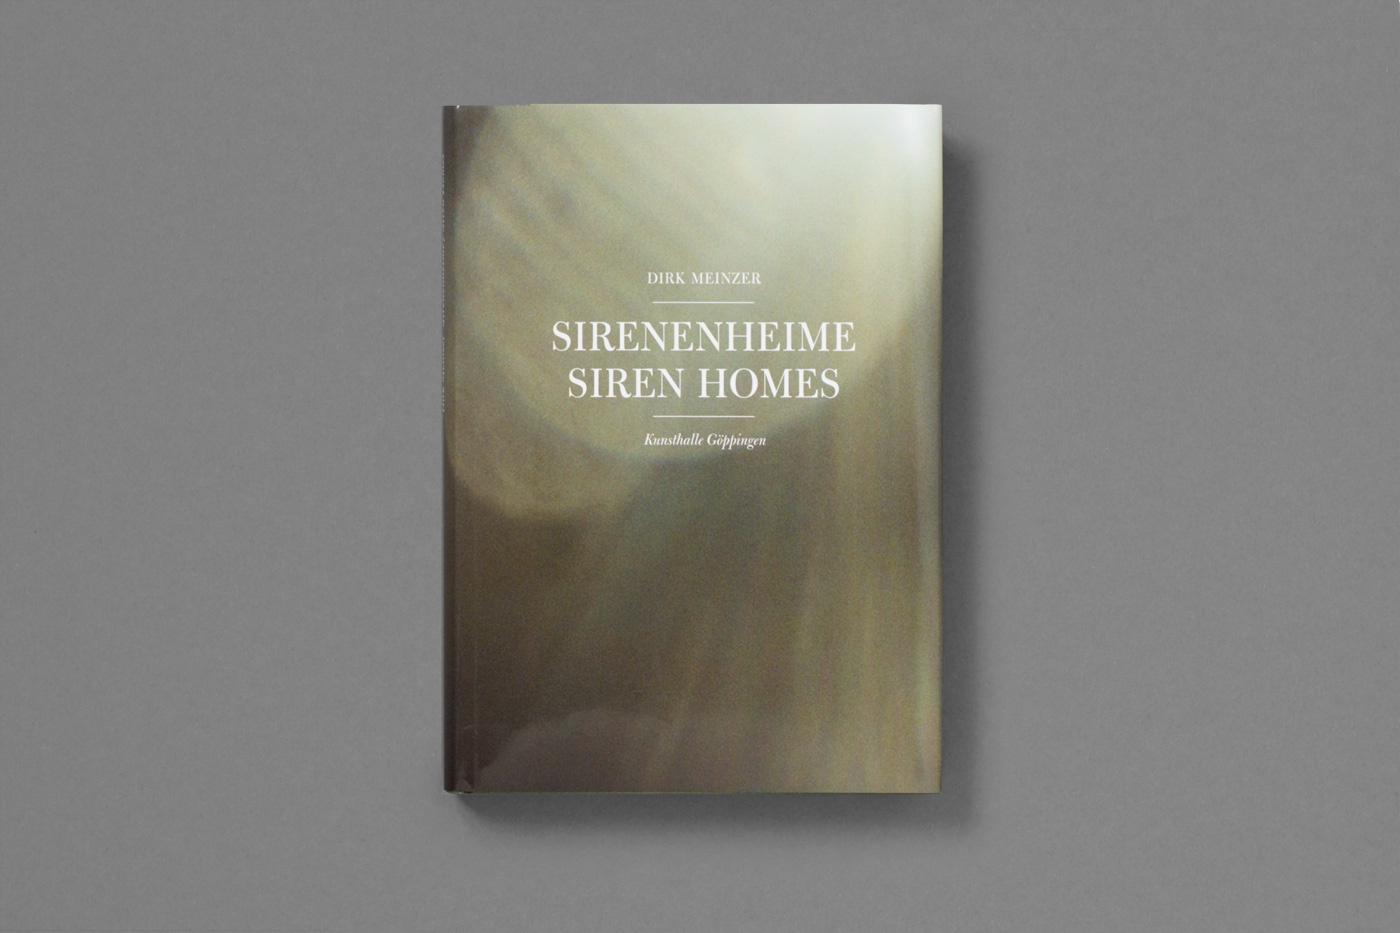 Dirk Meinzer: Sirenenheime